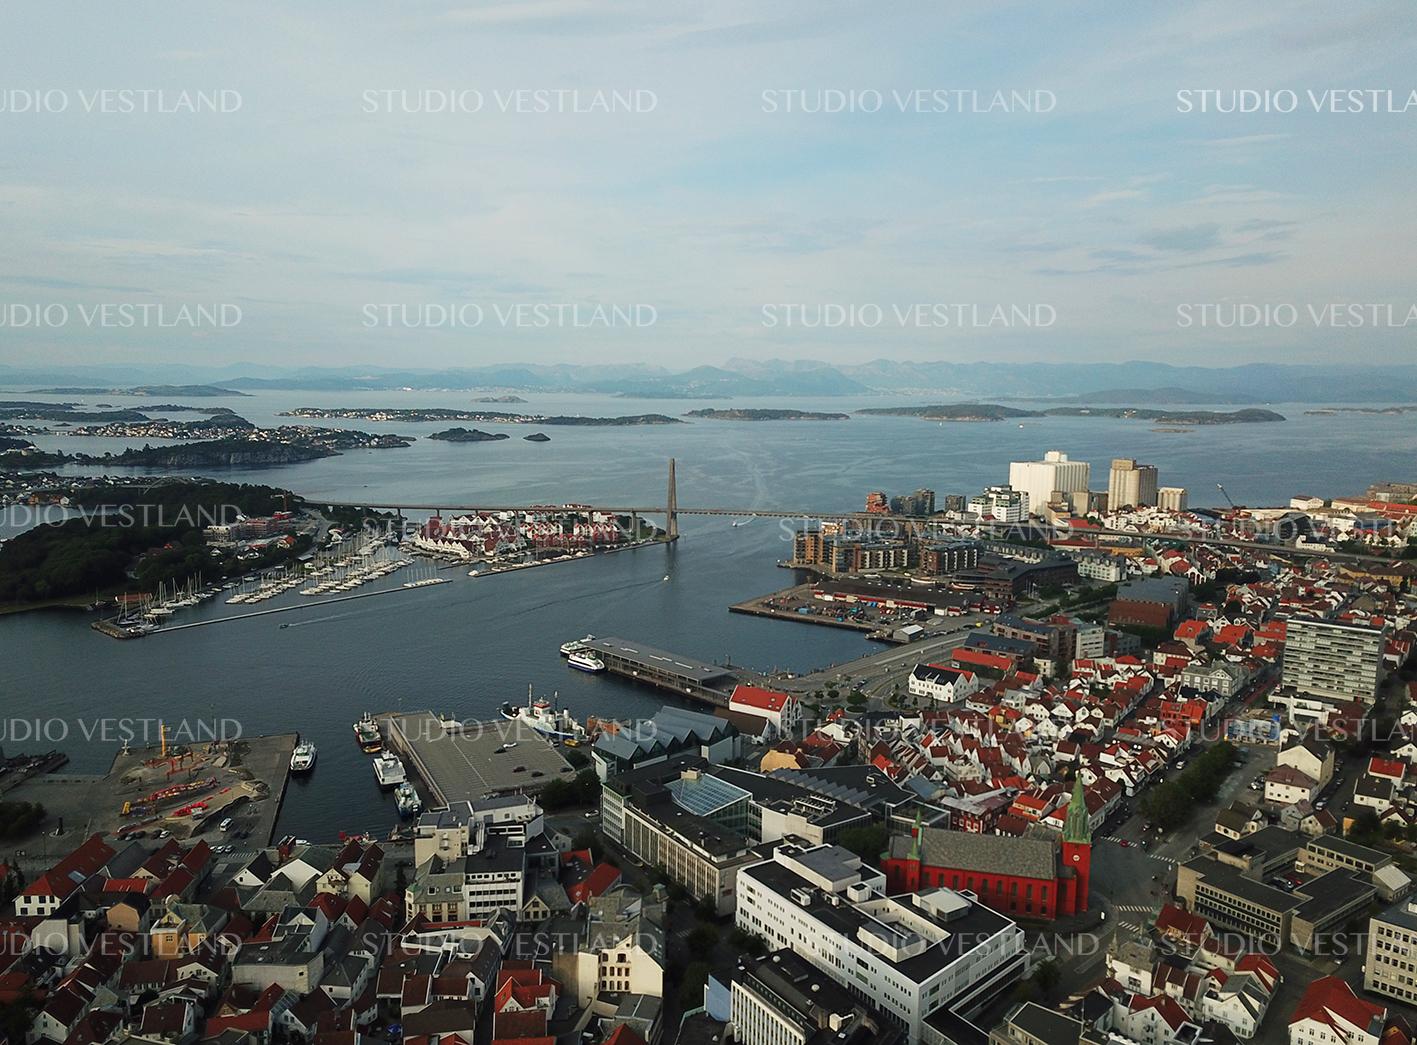 Studio Vestland - Stavanger 08